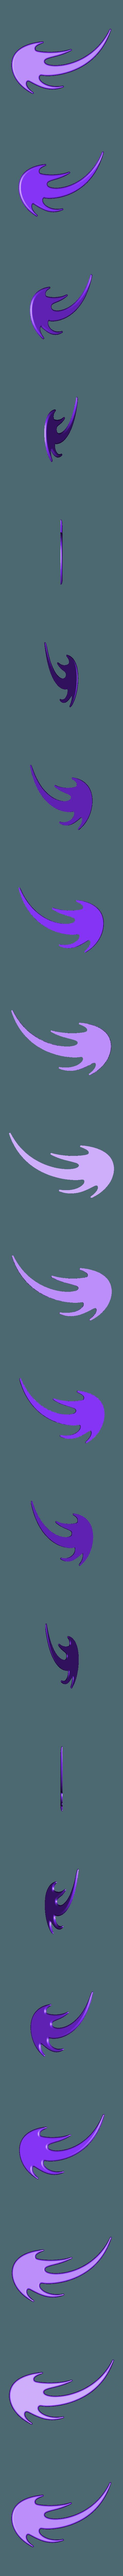 Space Decals_ Comet C.stl Download free STL file Space Decals • 3D printing template, Hom3d